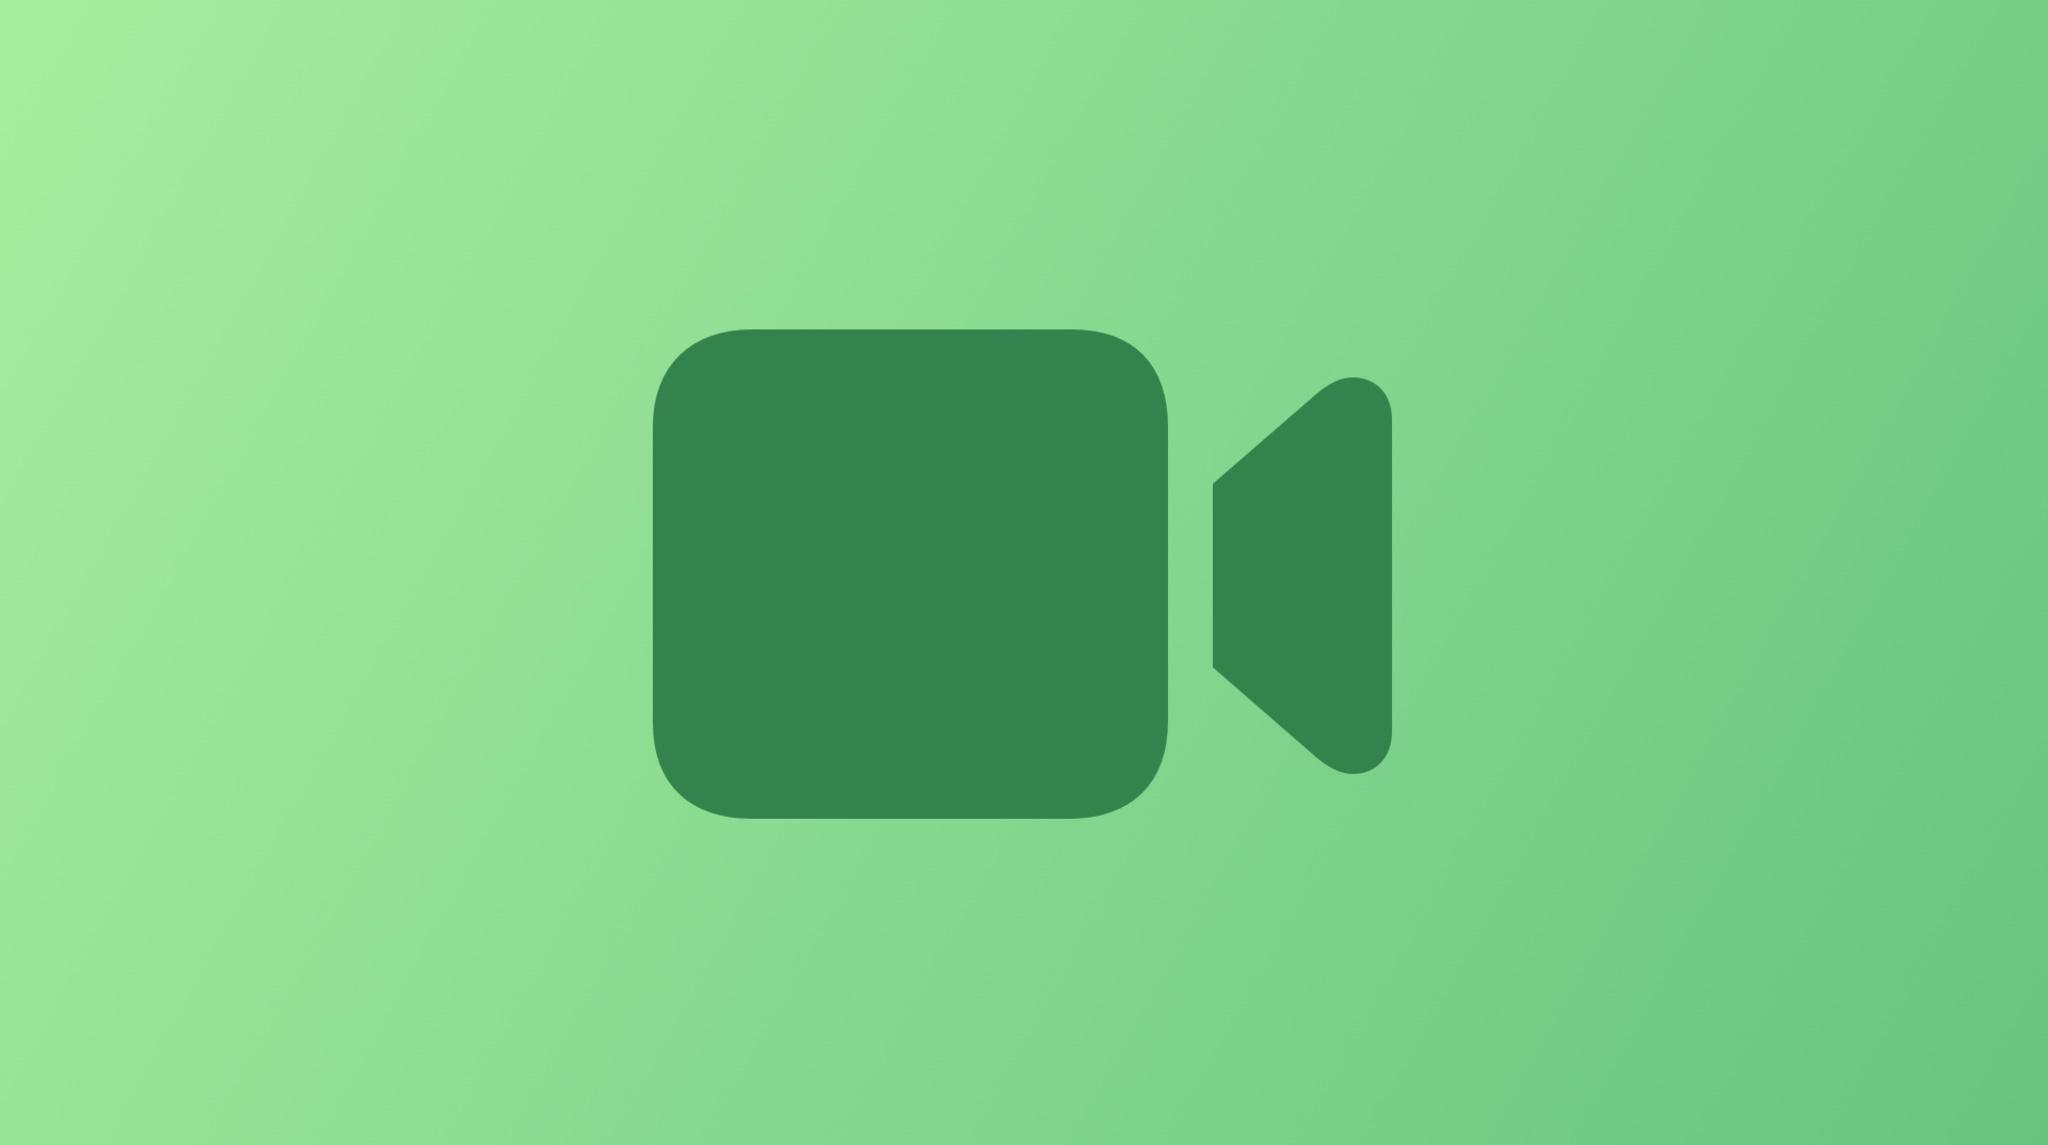 HLS camera icon